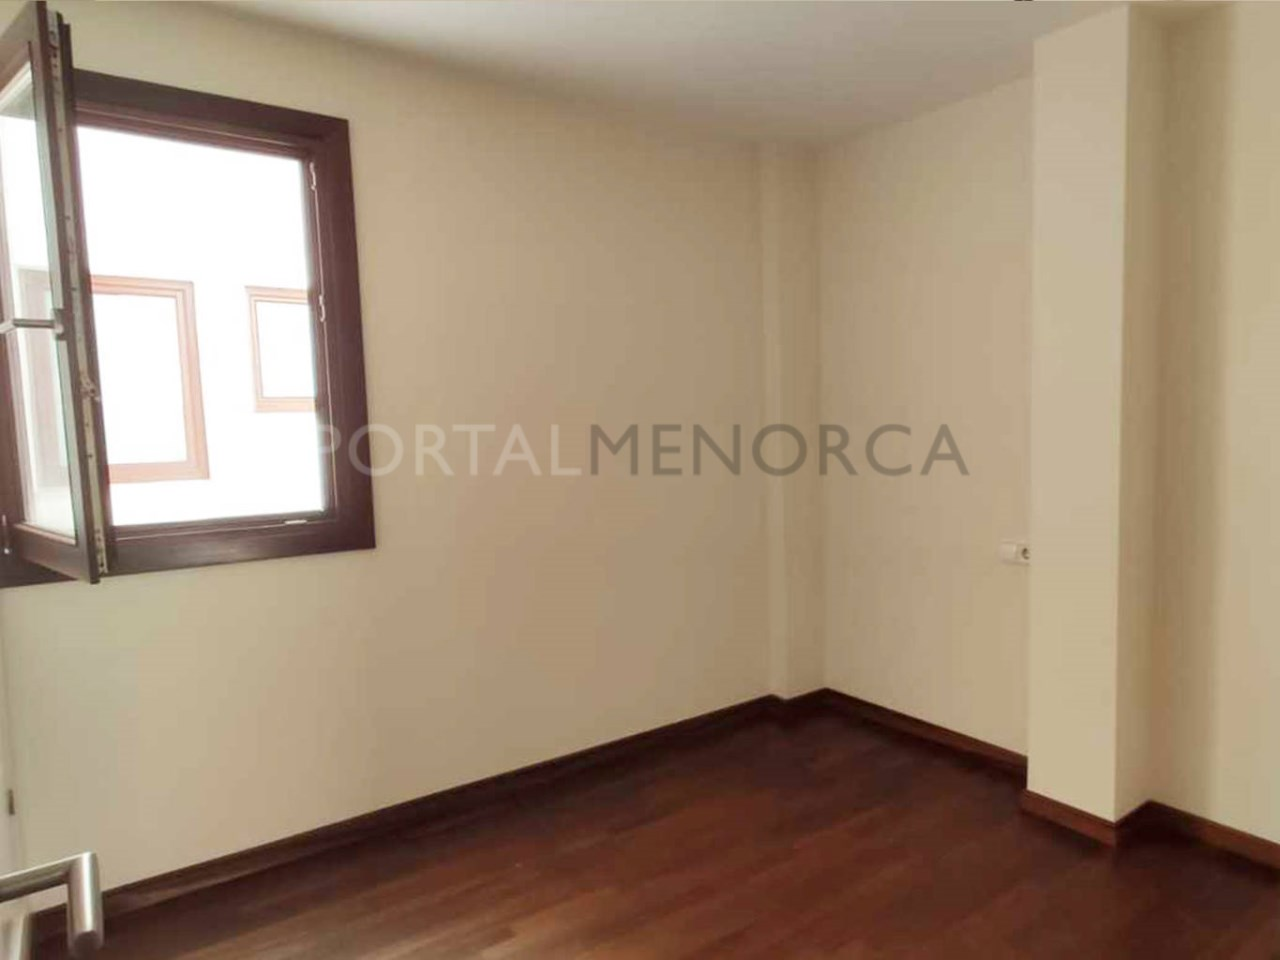 Apartment in the center of Ciutadella_room